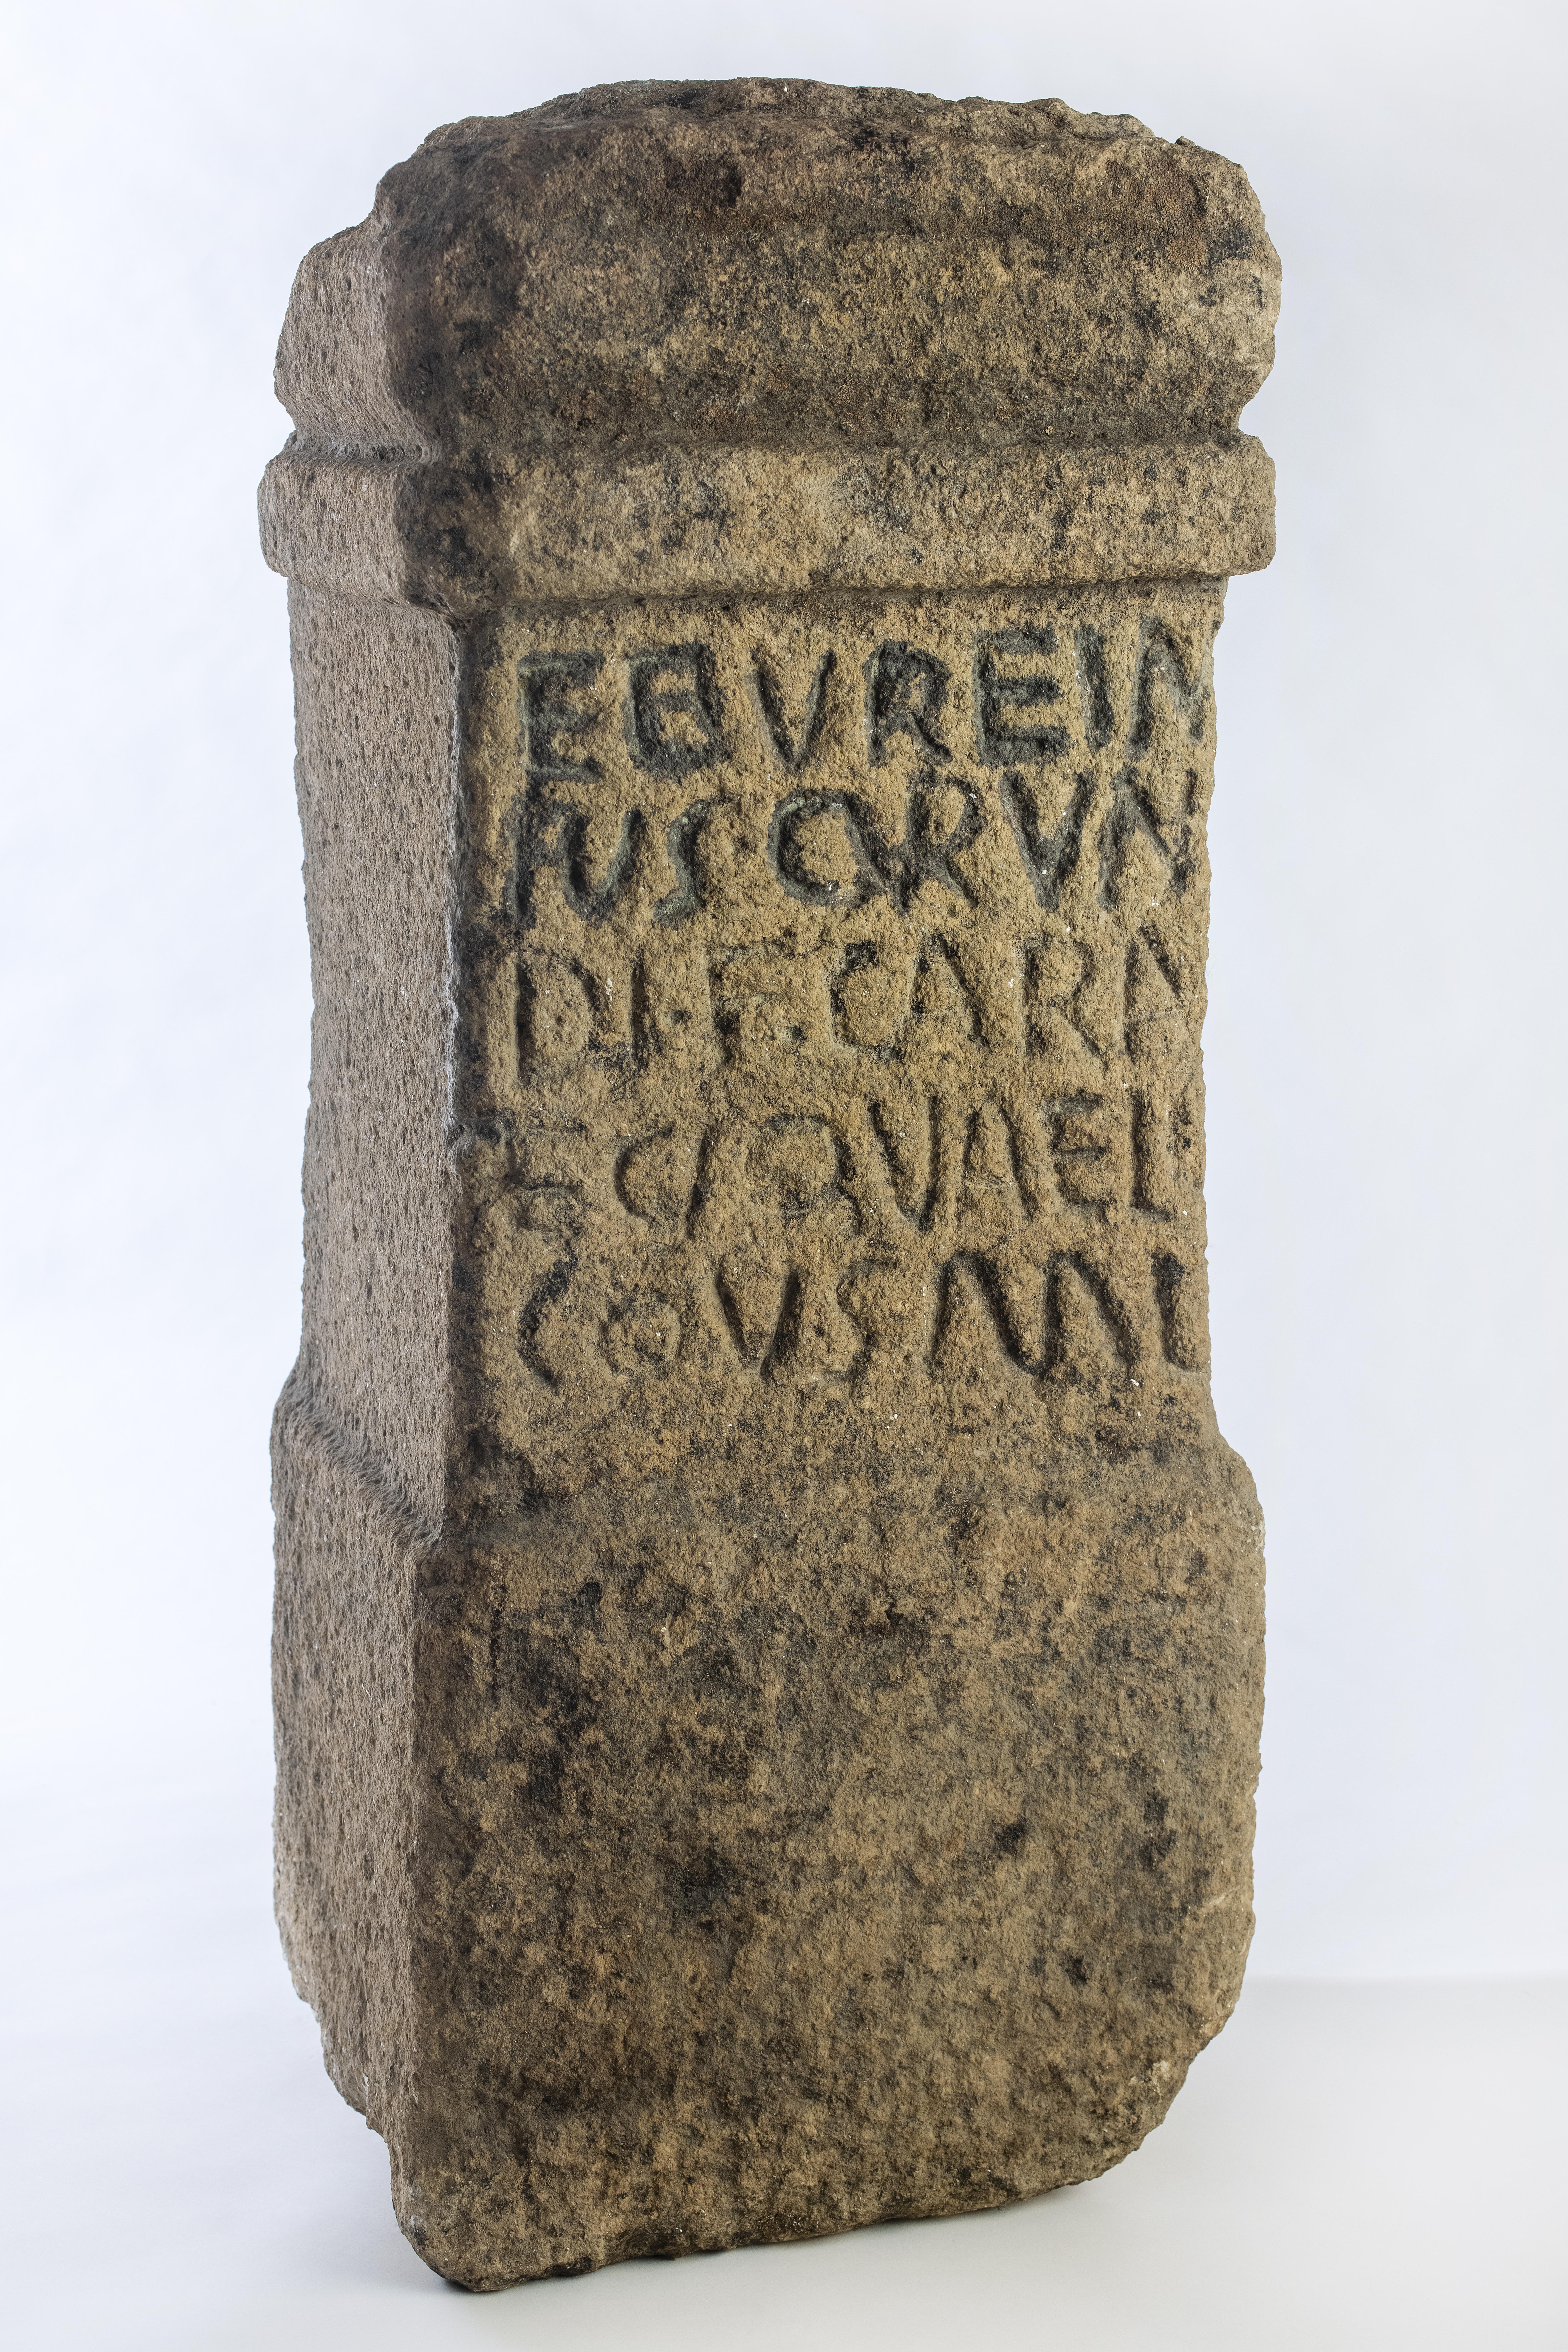 ARA DE POSTOLOBOSOPostoloboso, Candeleda.Roma. Siglo II/III d.c.Granito / 86 x 35 x 30 cm.[71/16/4]. Sala V.